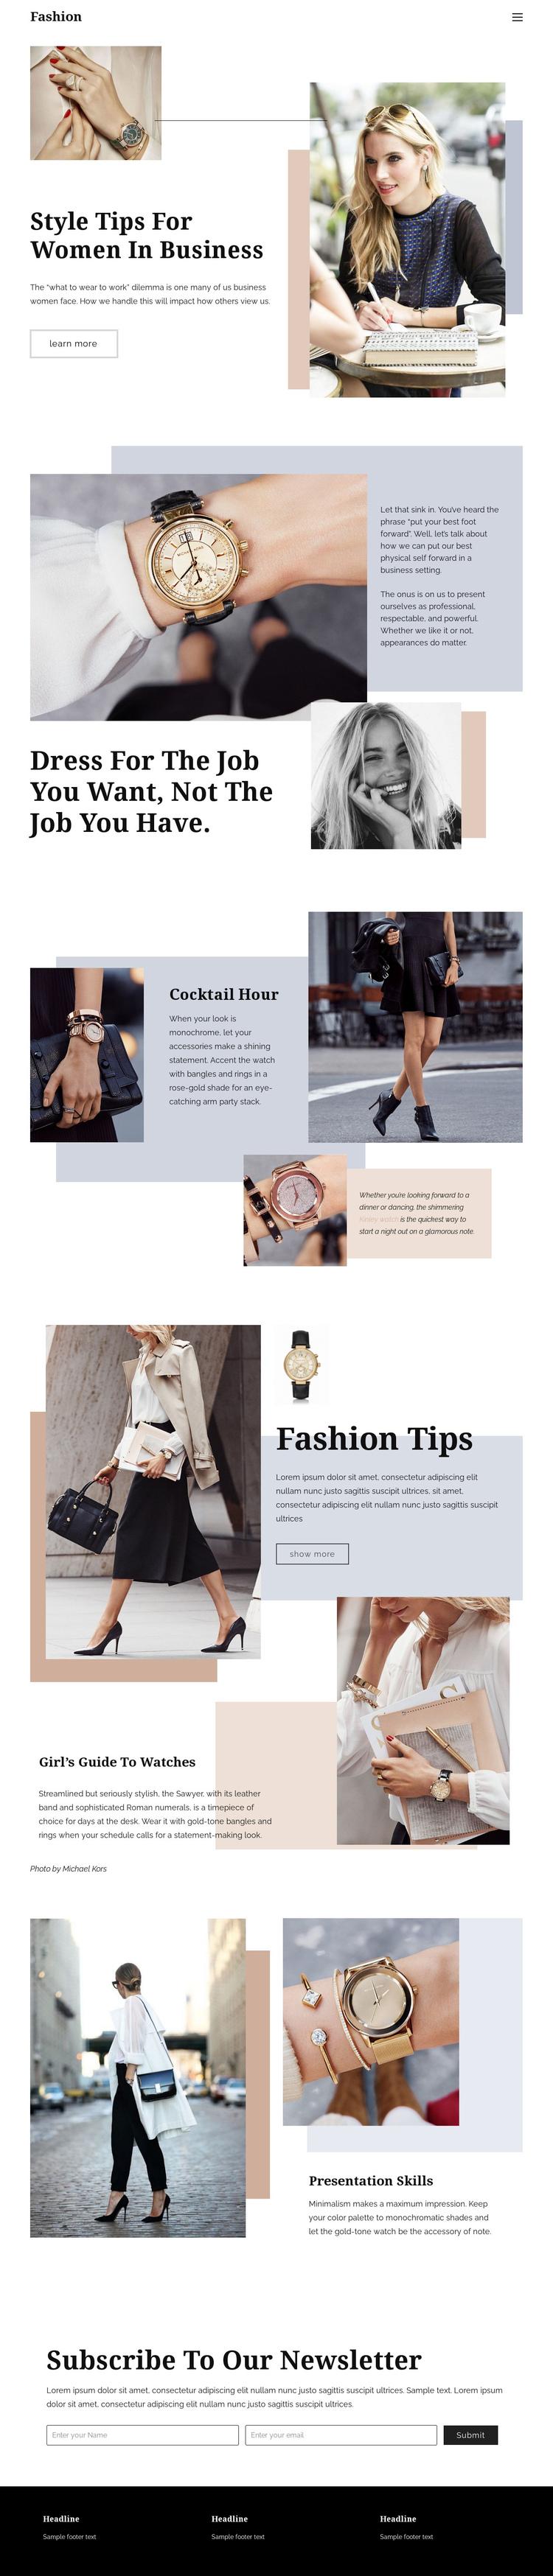 Fashion tips Website Builder Software